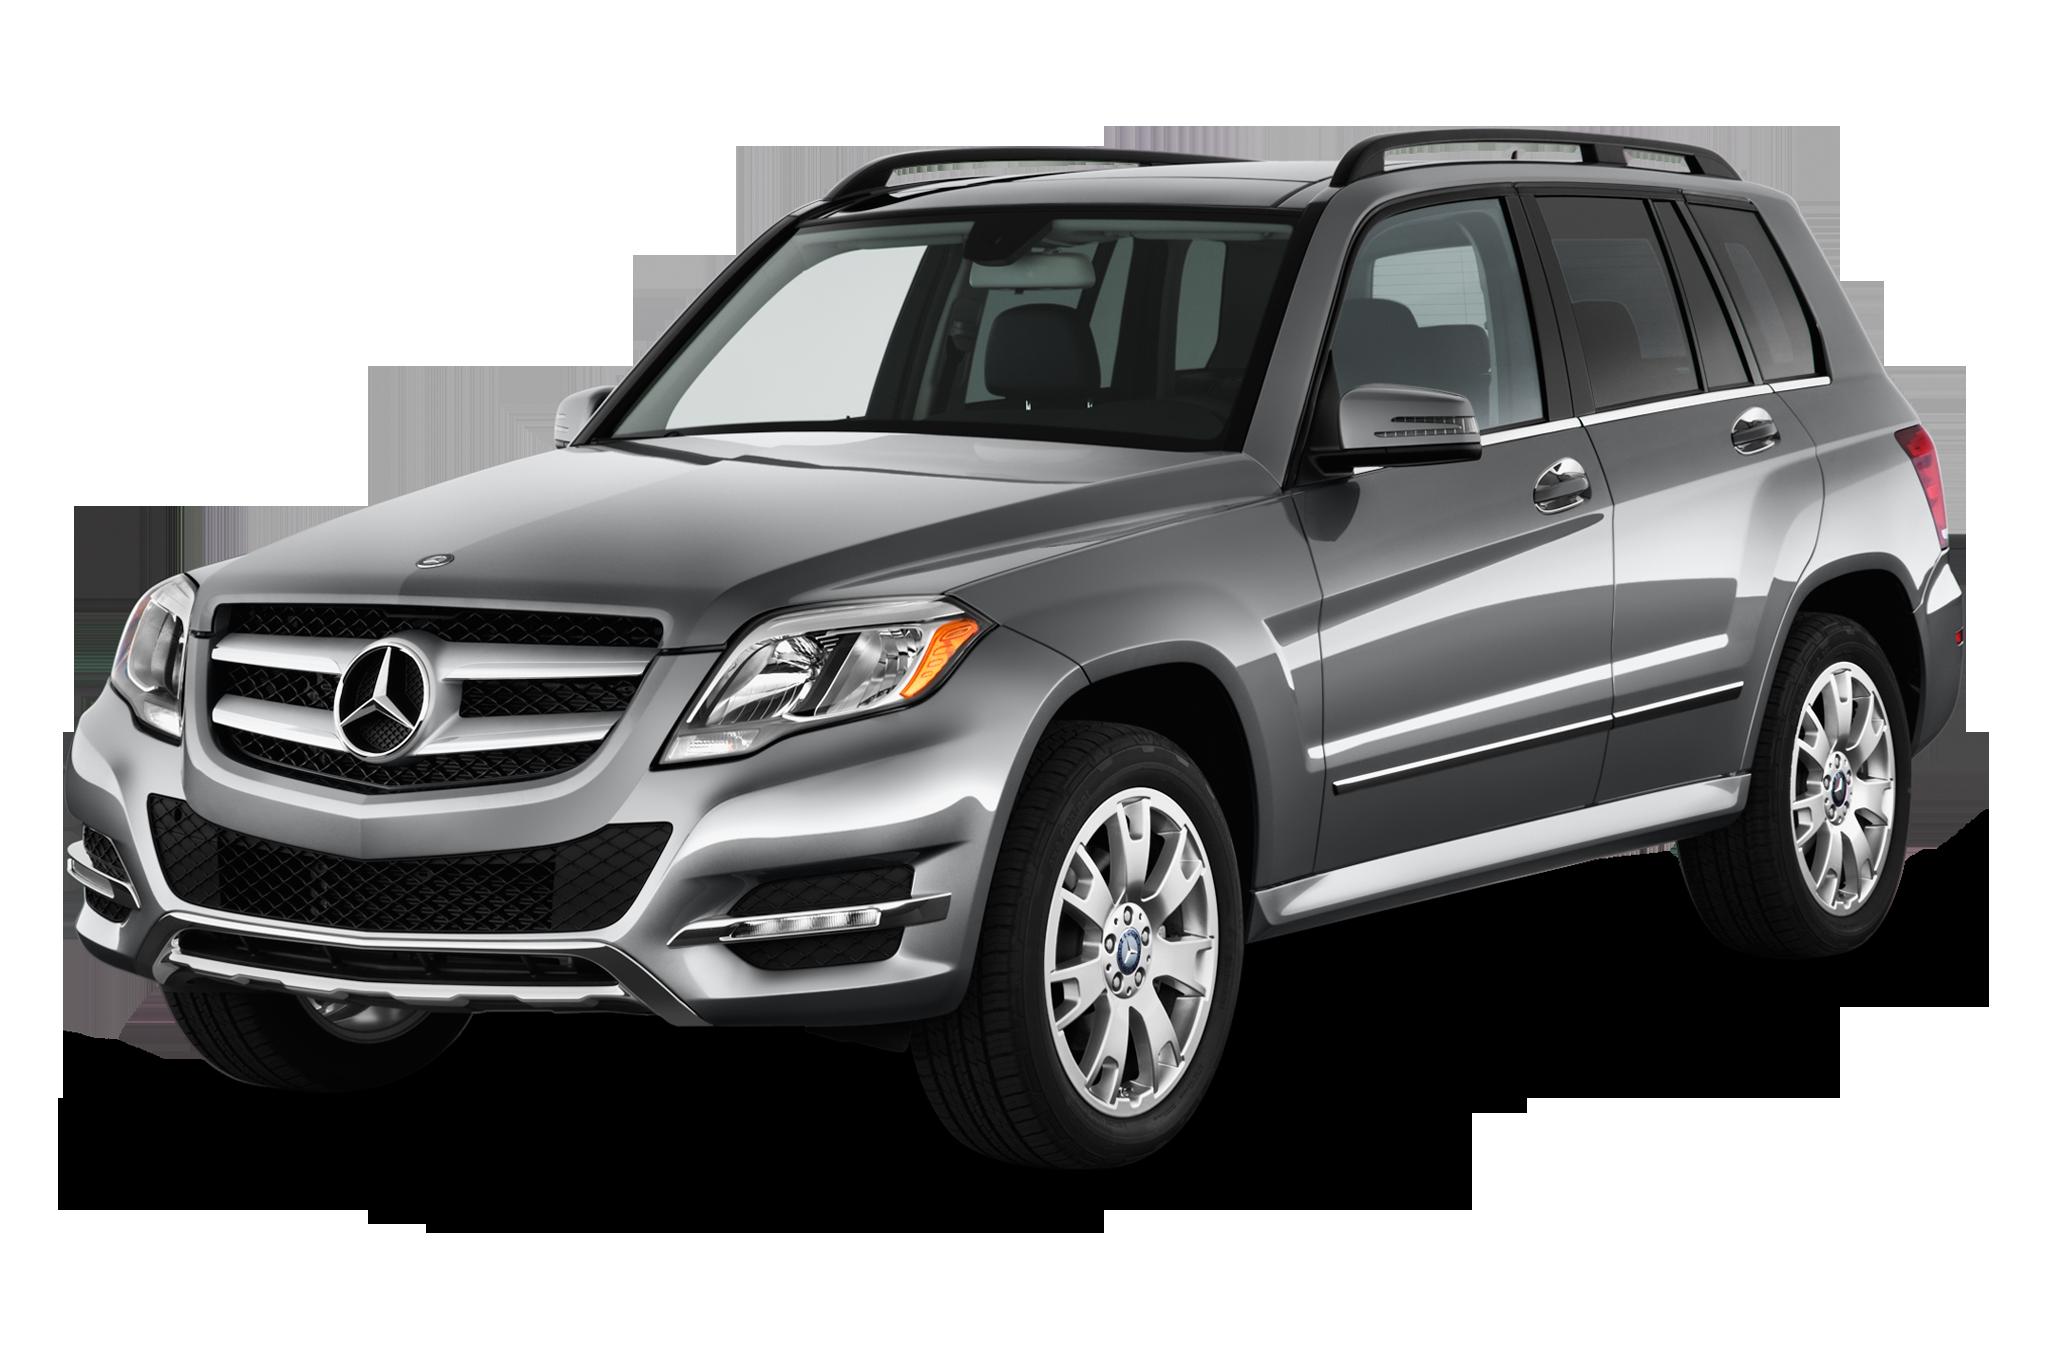 Mercedes Benz Glk Cl 25 Anuncio Saltear 1